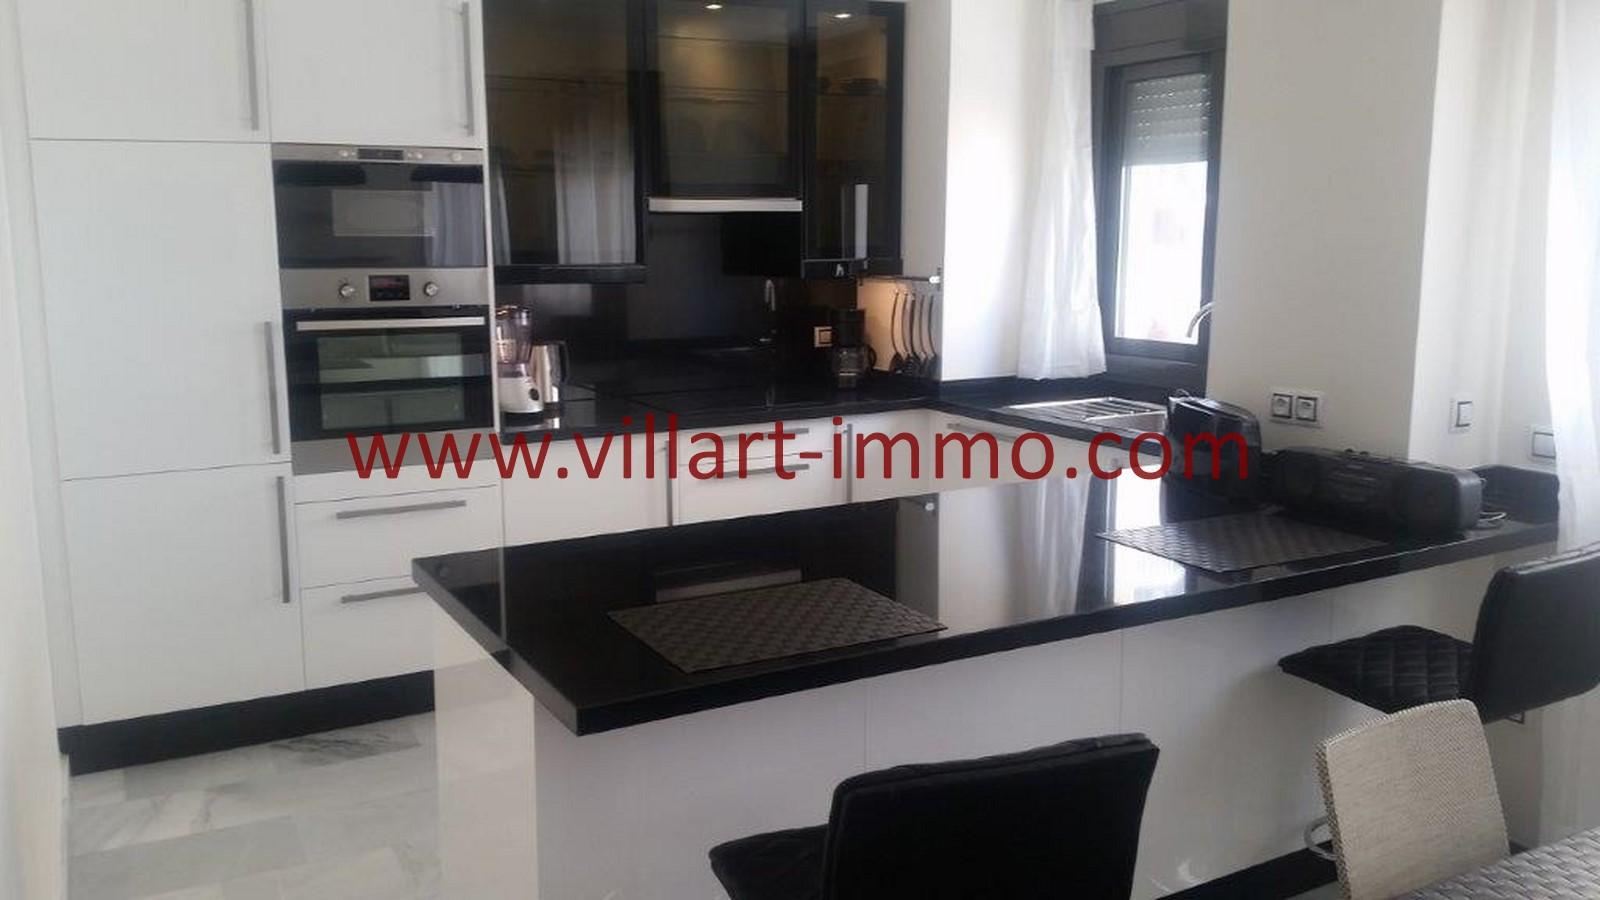 2-location-appartement-meuble-tanger-cuisine-l975-villart-immo